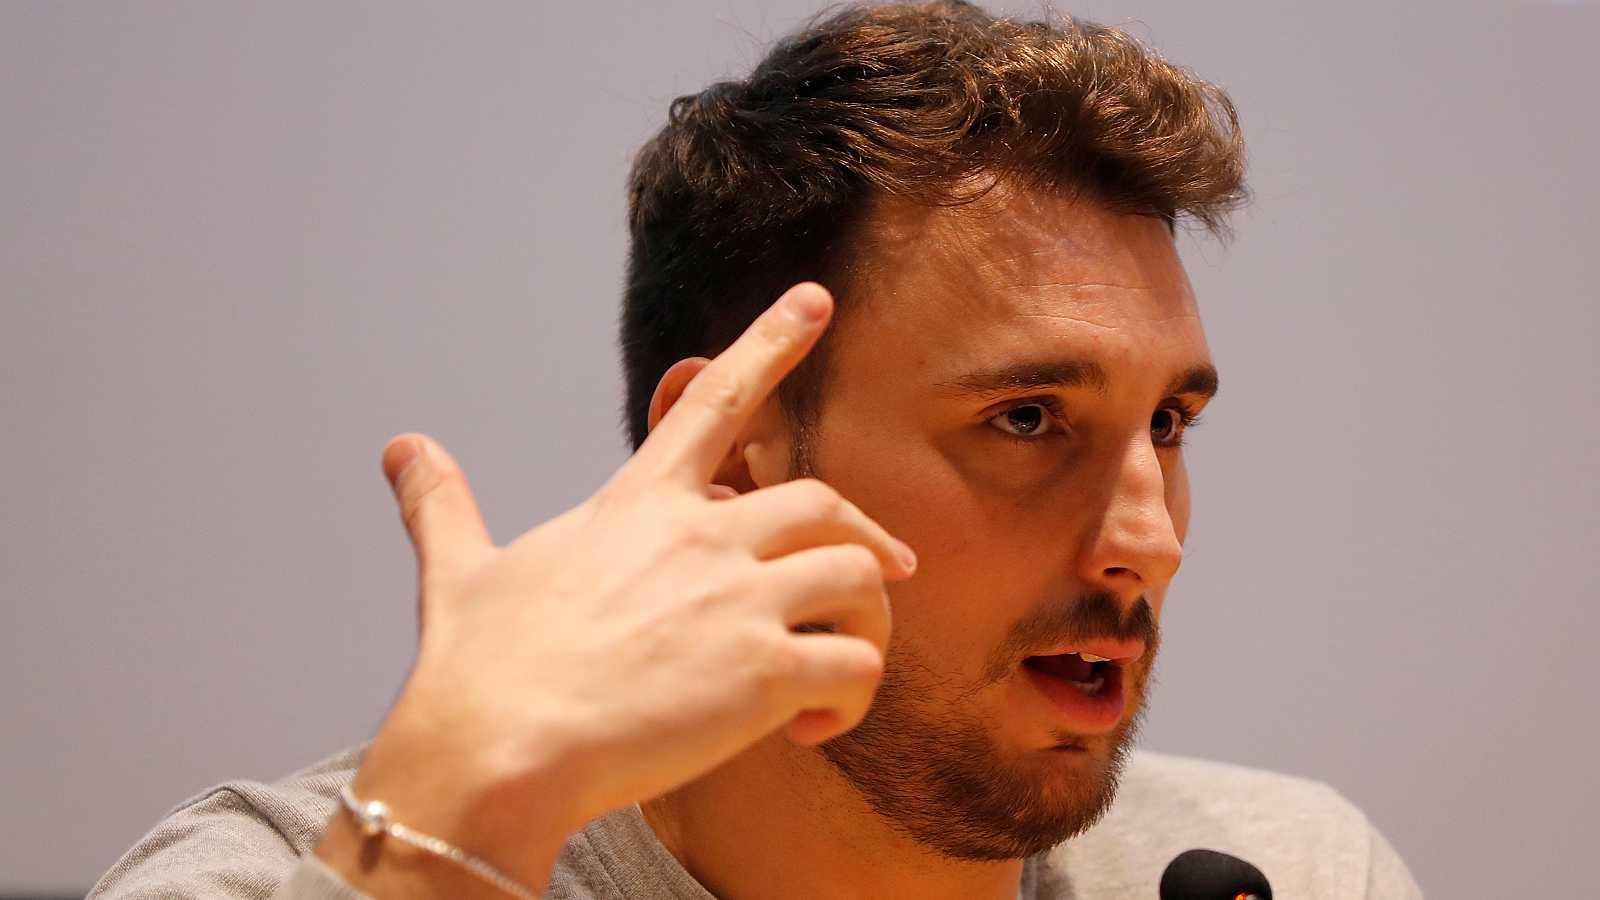 Víctor Gutiérrez denuncia insultos homófobos en un partido de la liga de waterpolo